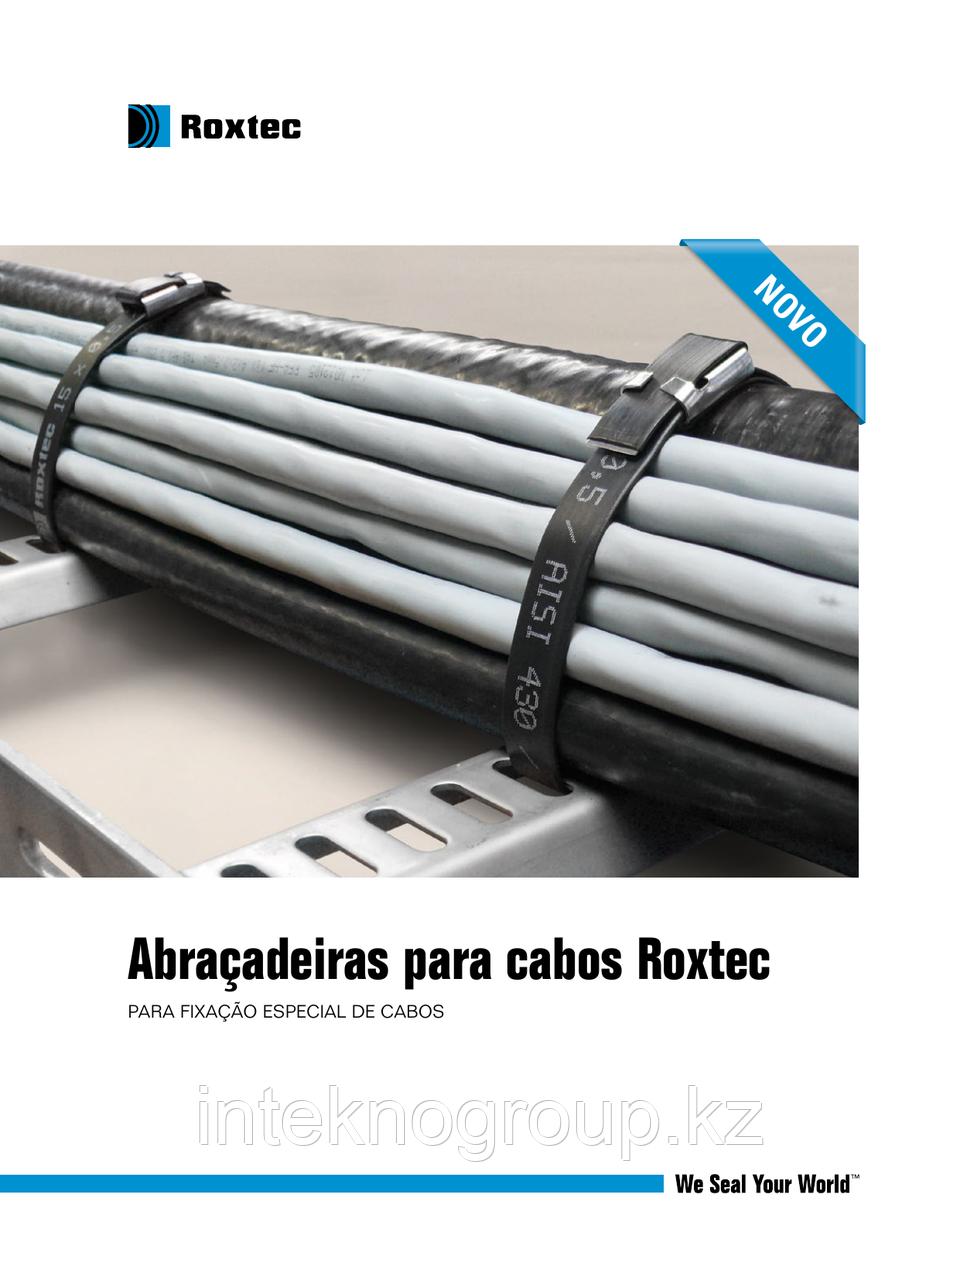 Roxtec Cable straps Strap 08x0,3 black/ss. L=600 mm